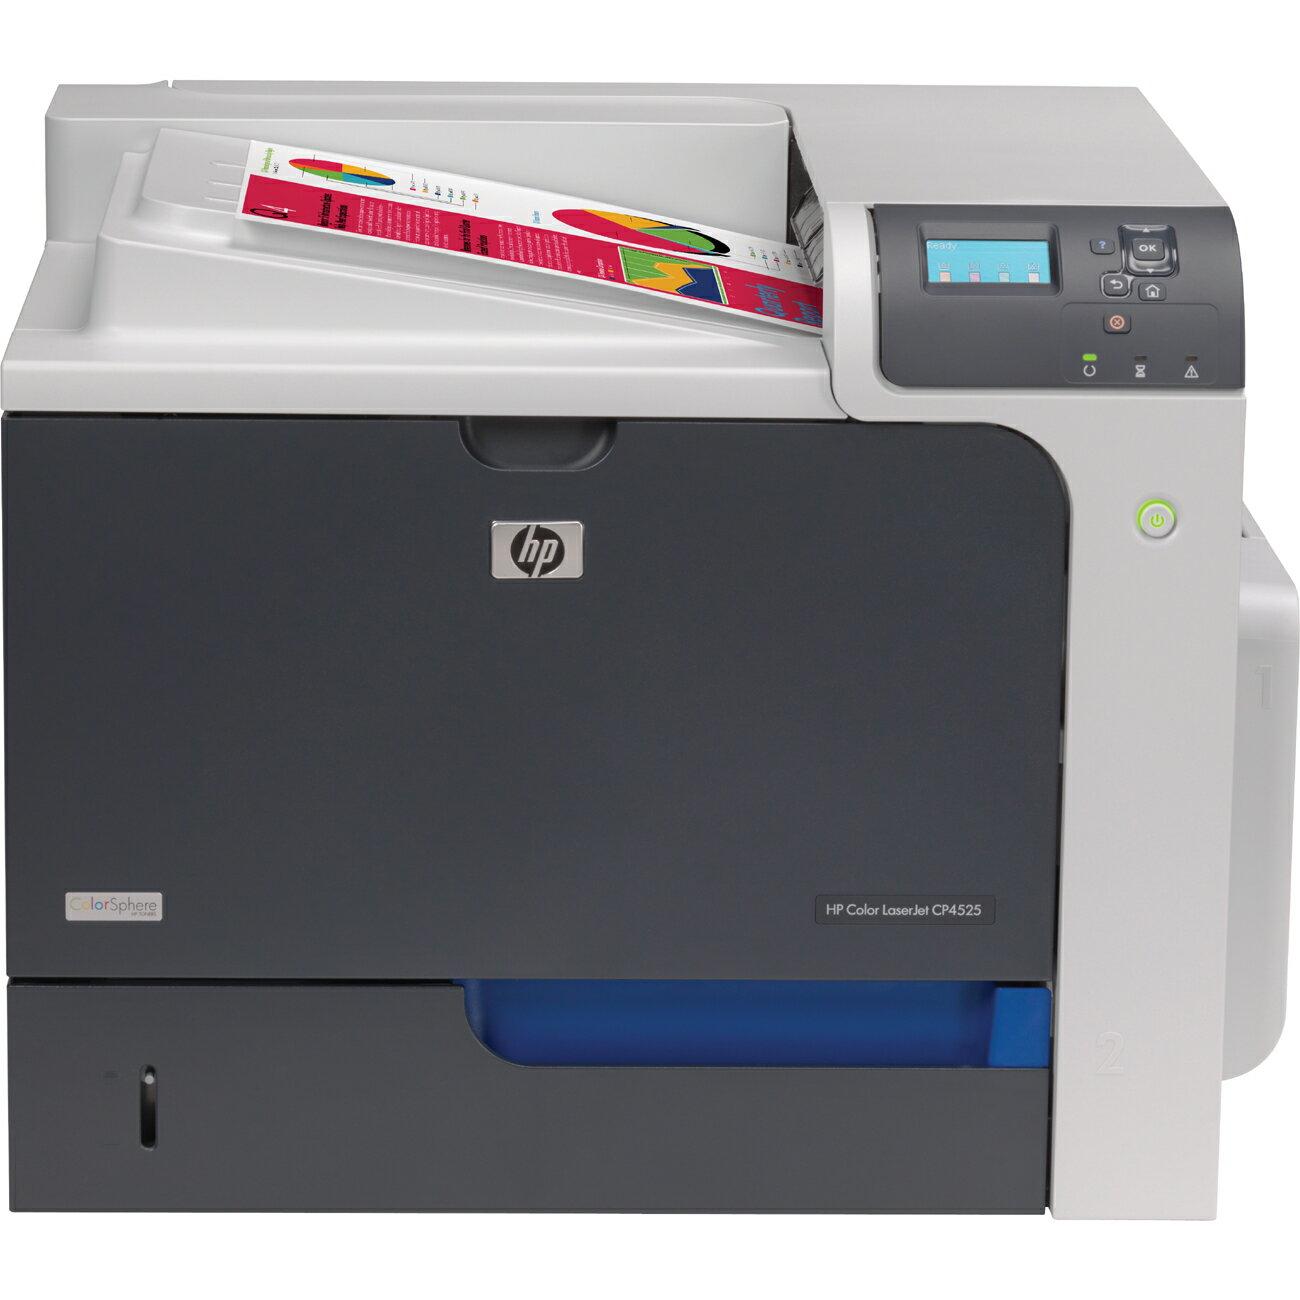 HP LaserJet CP4000 CP4525N Laser Printer - Color - 1200 x 1200 dpi Print - Plain Paper Print - Desktop - 42 ppm Mono / 42 ppm Color Print - Letter, Legal, Executive, Postcard, Envelope No. 10, Envelope No. 9, Monarch Envelope, Statement - 600 sheets Stand 0